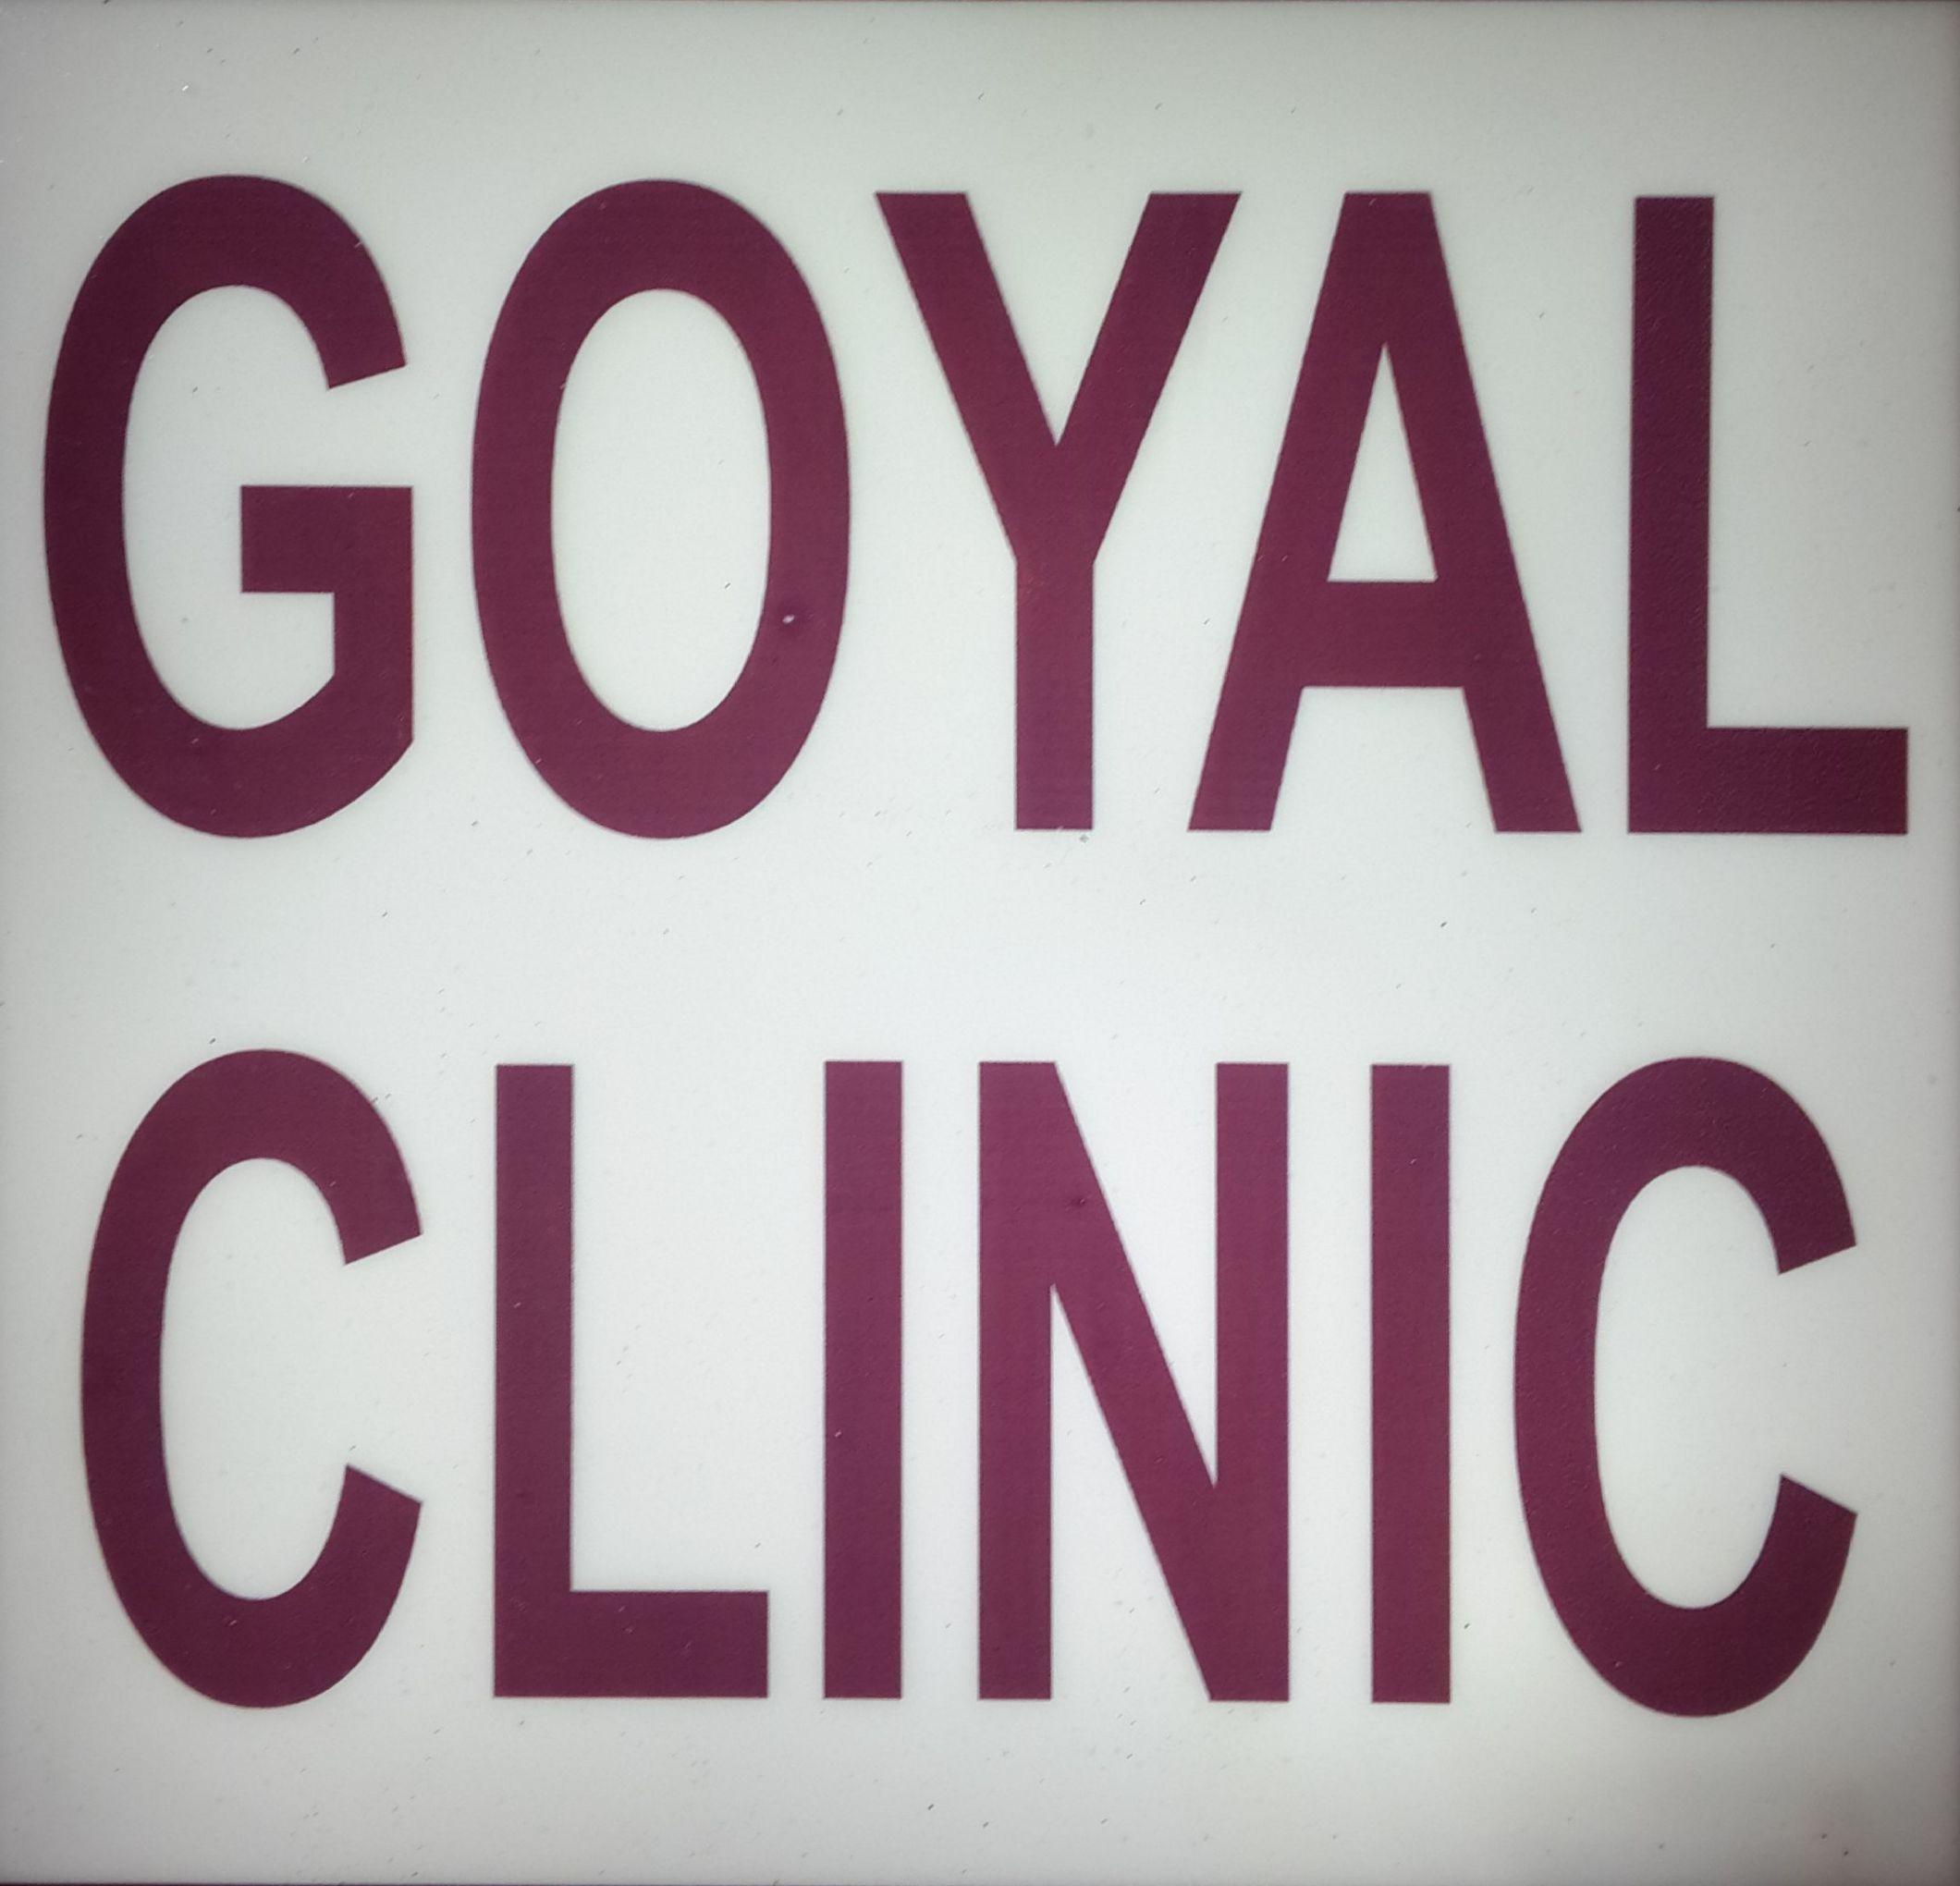 Goyal Clinic